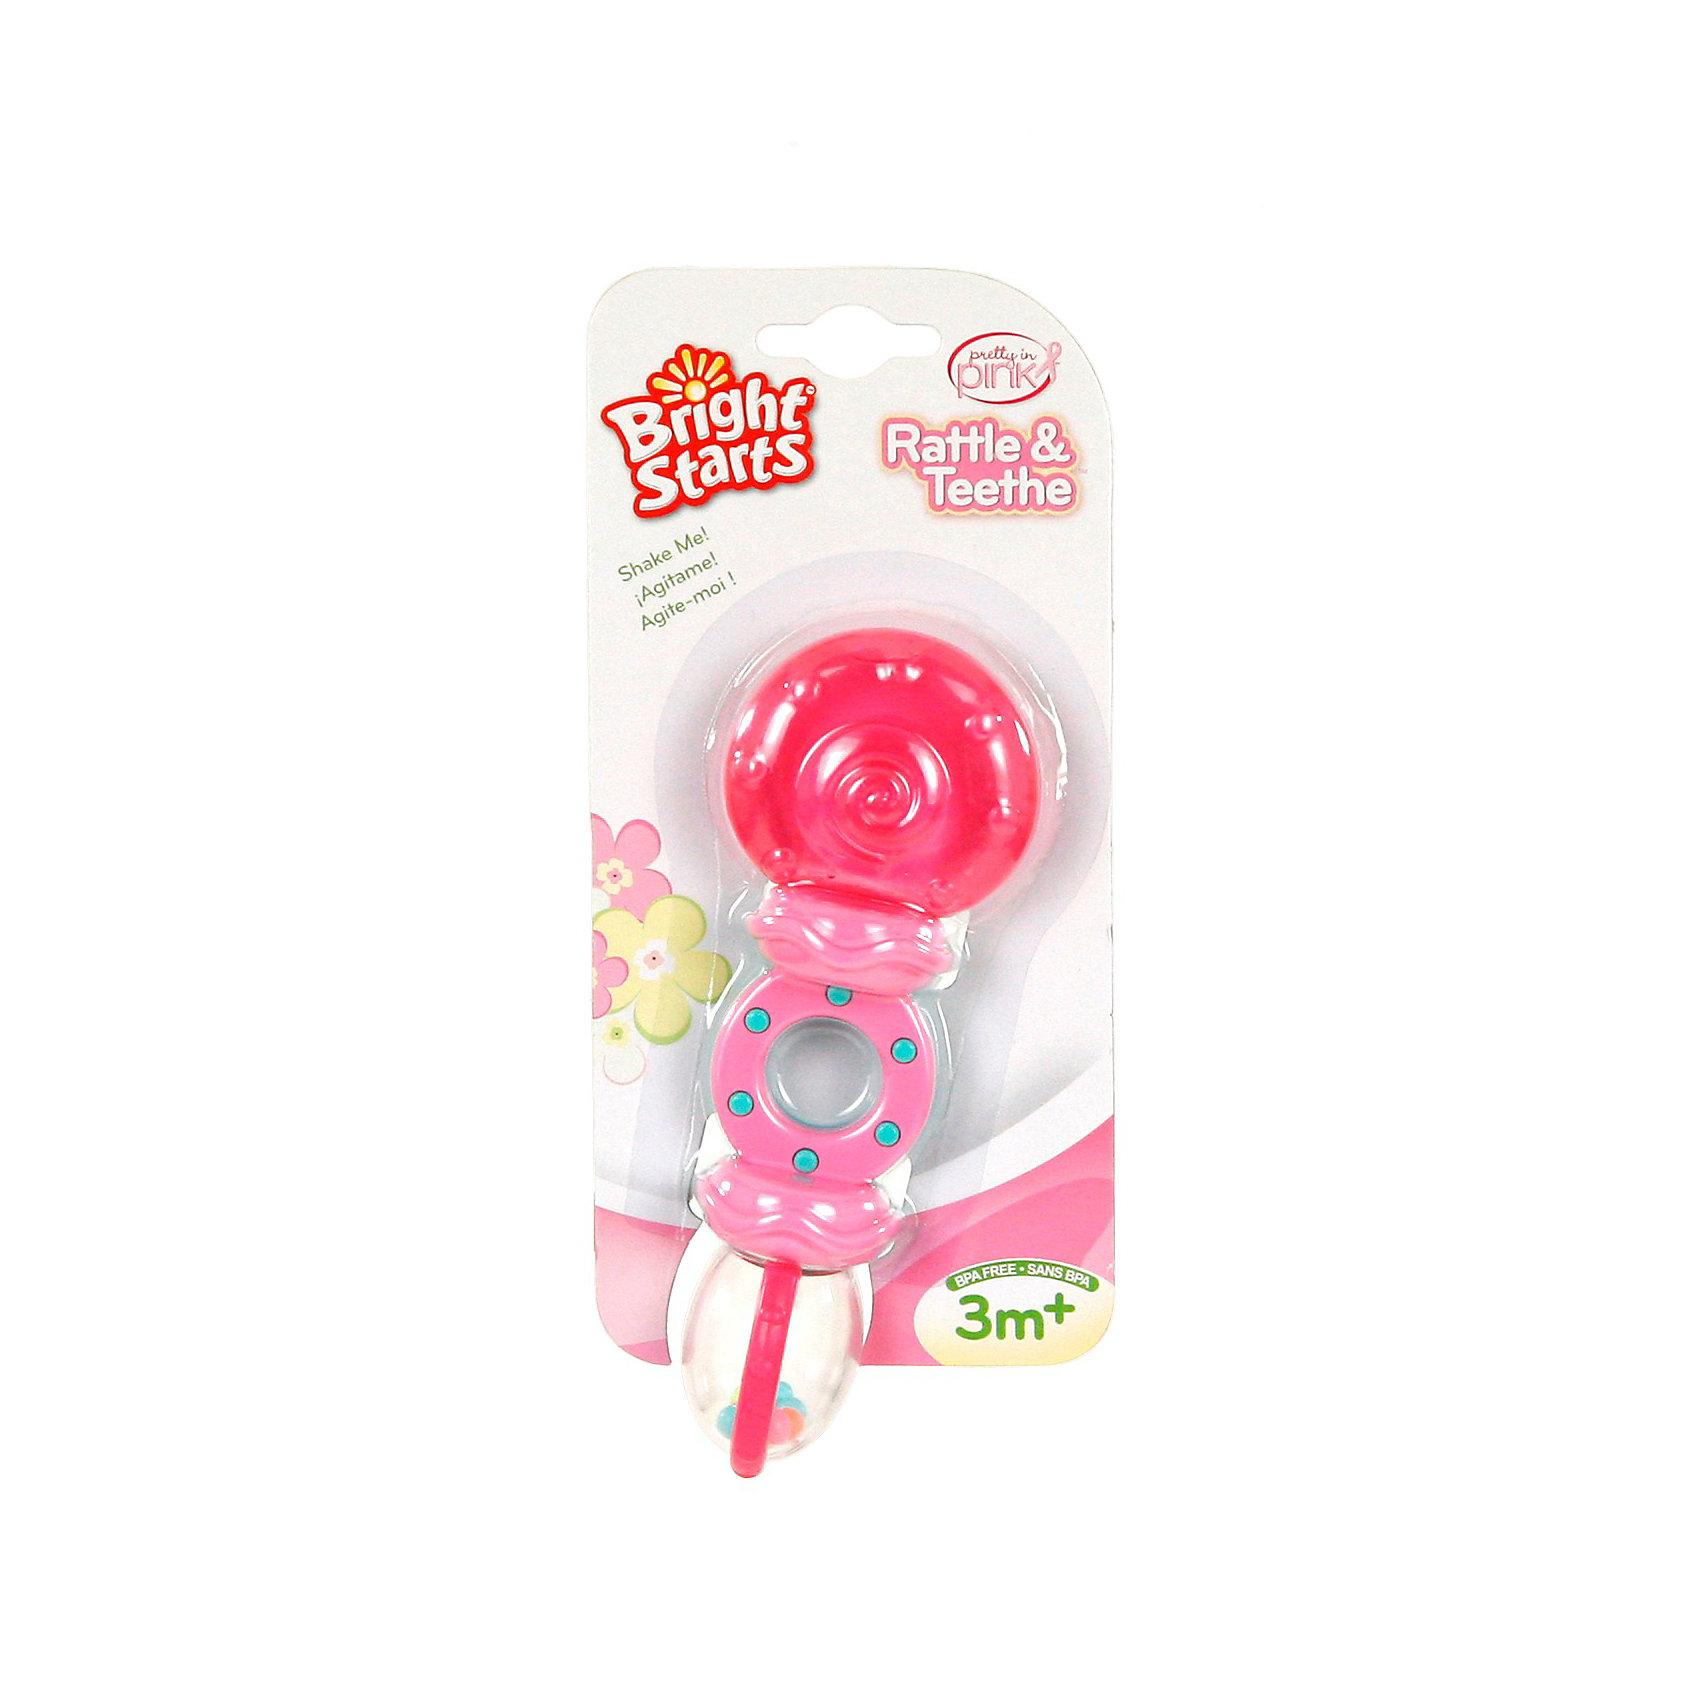 Bright Starts Погремушка с прорезывателем Леденец Bright Starts, розовая прорезыватели стеллар с погремушкой букетик